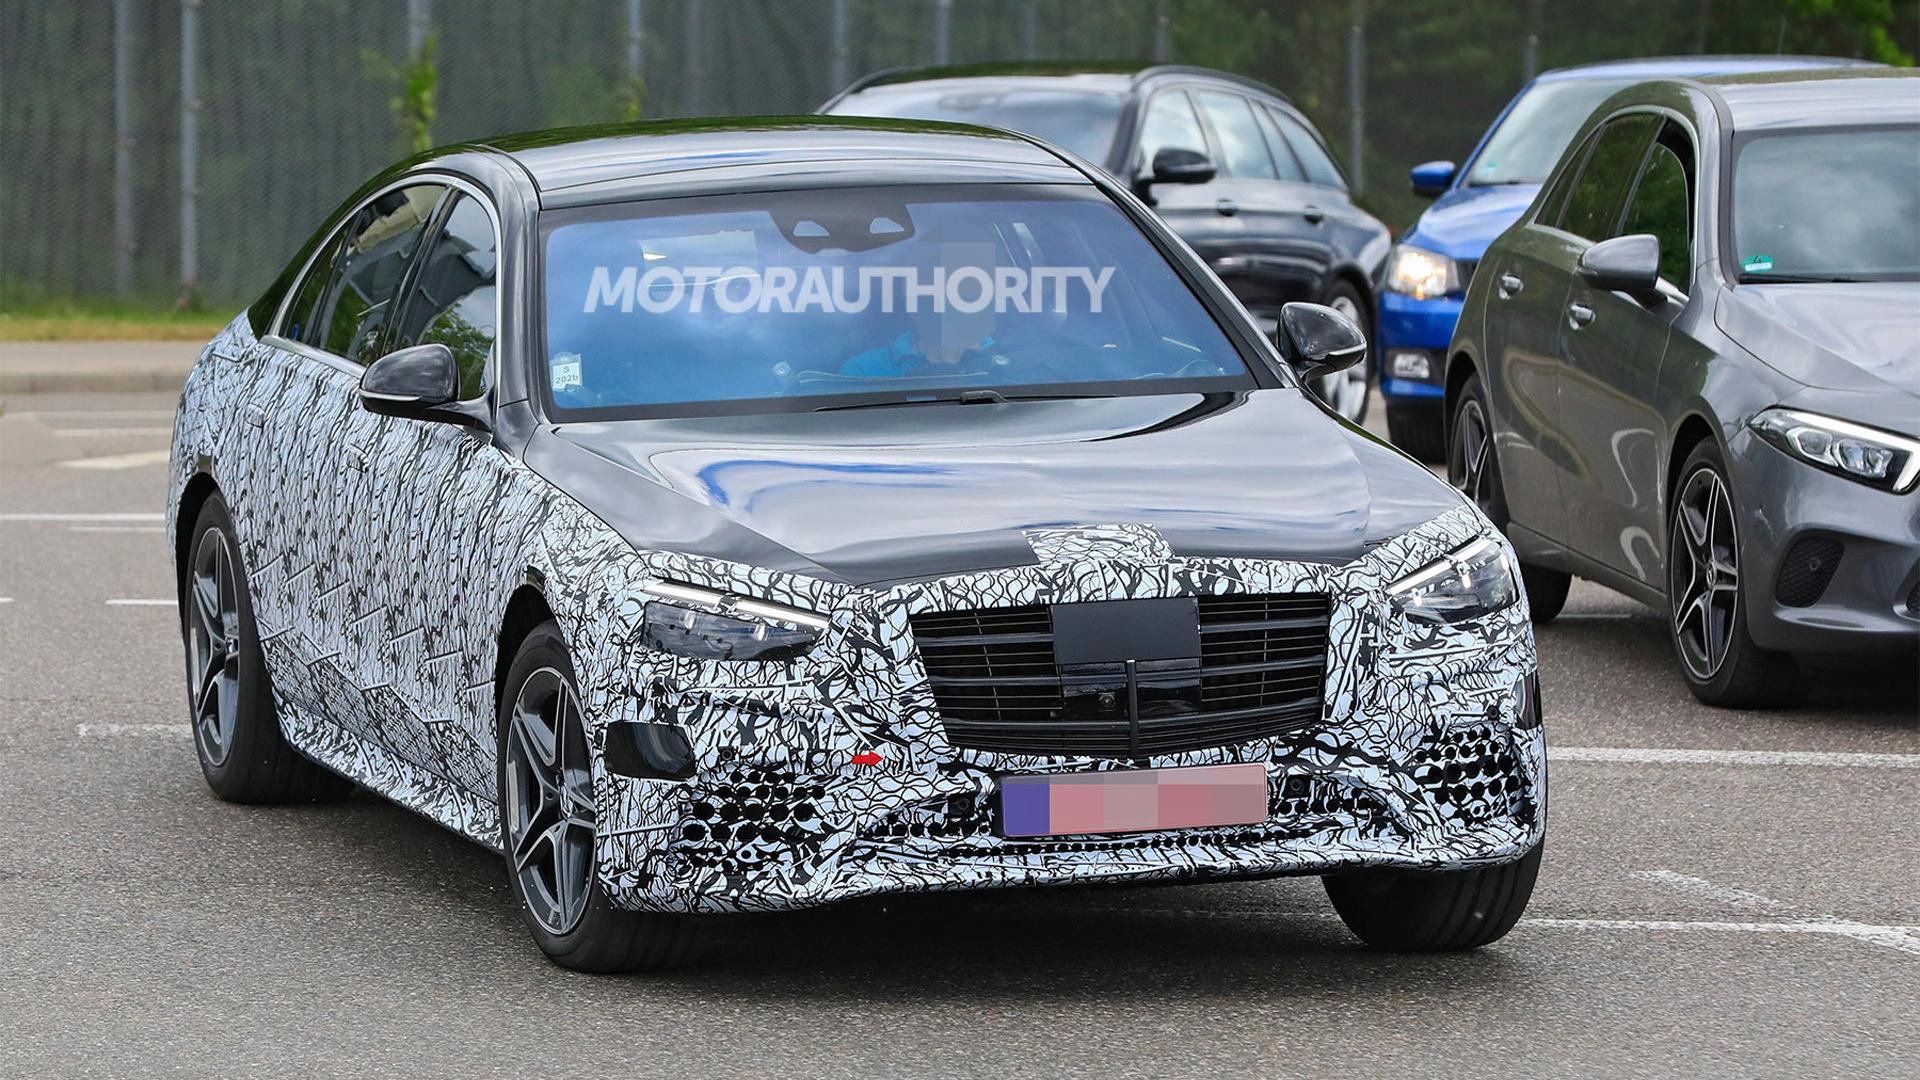 2021 Mercedes-Benz S-Class spy shots - Photo credit: S. Baldauf/SB-Medien